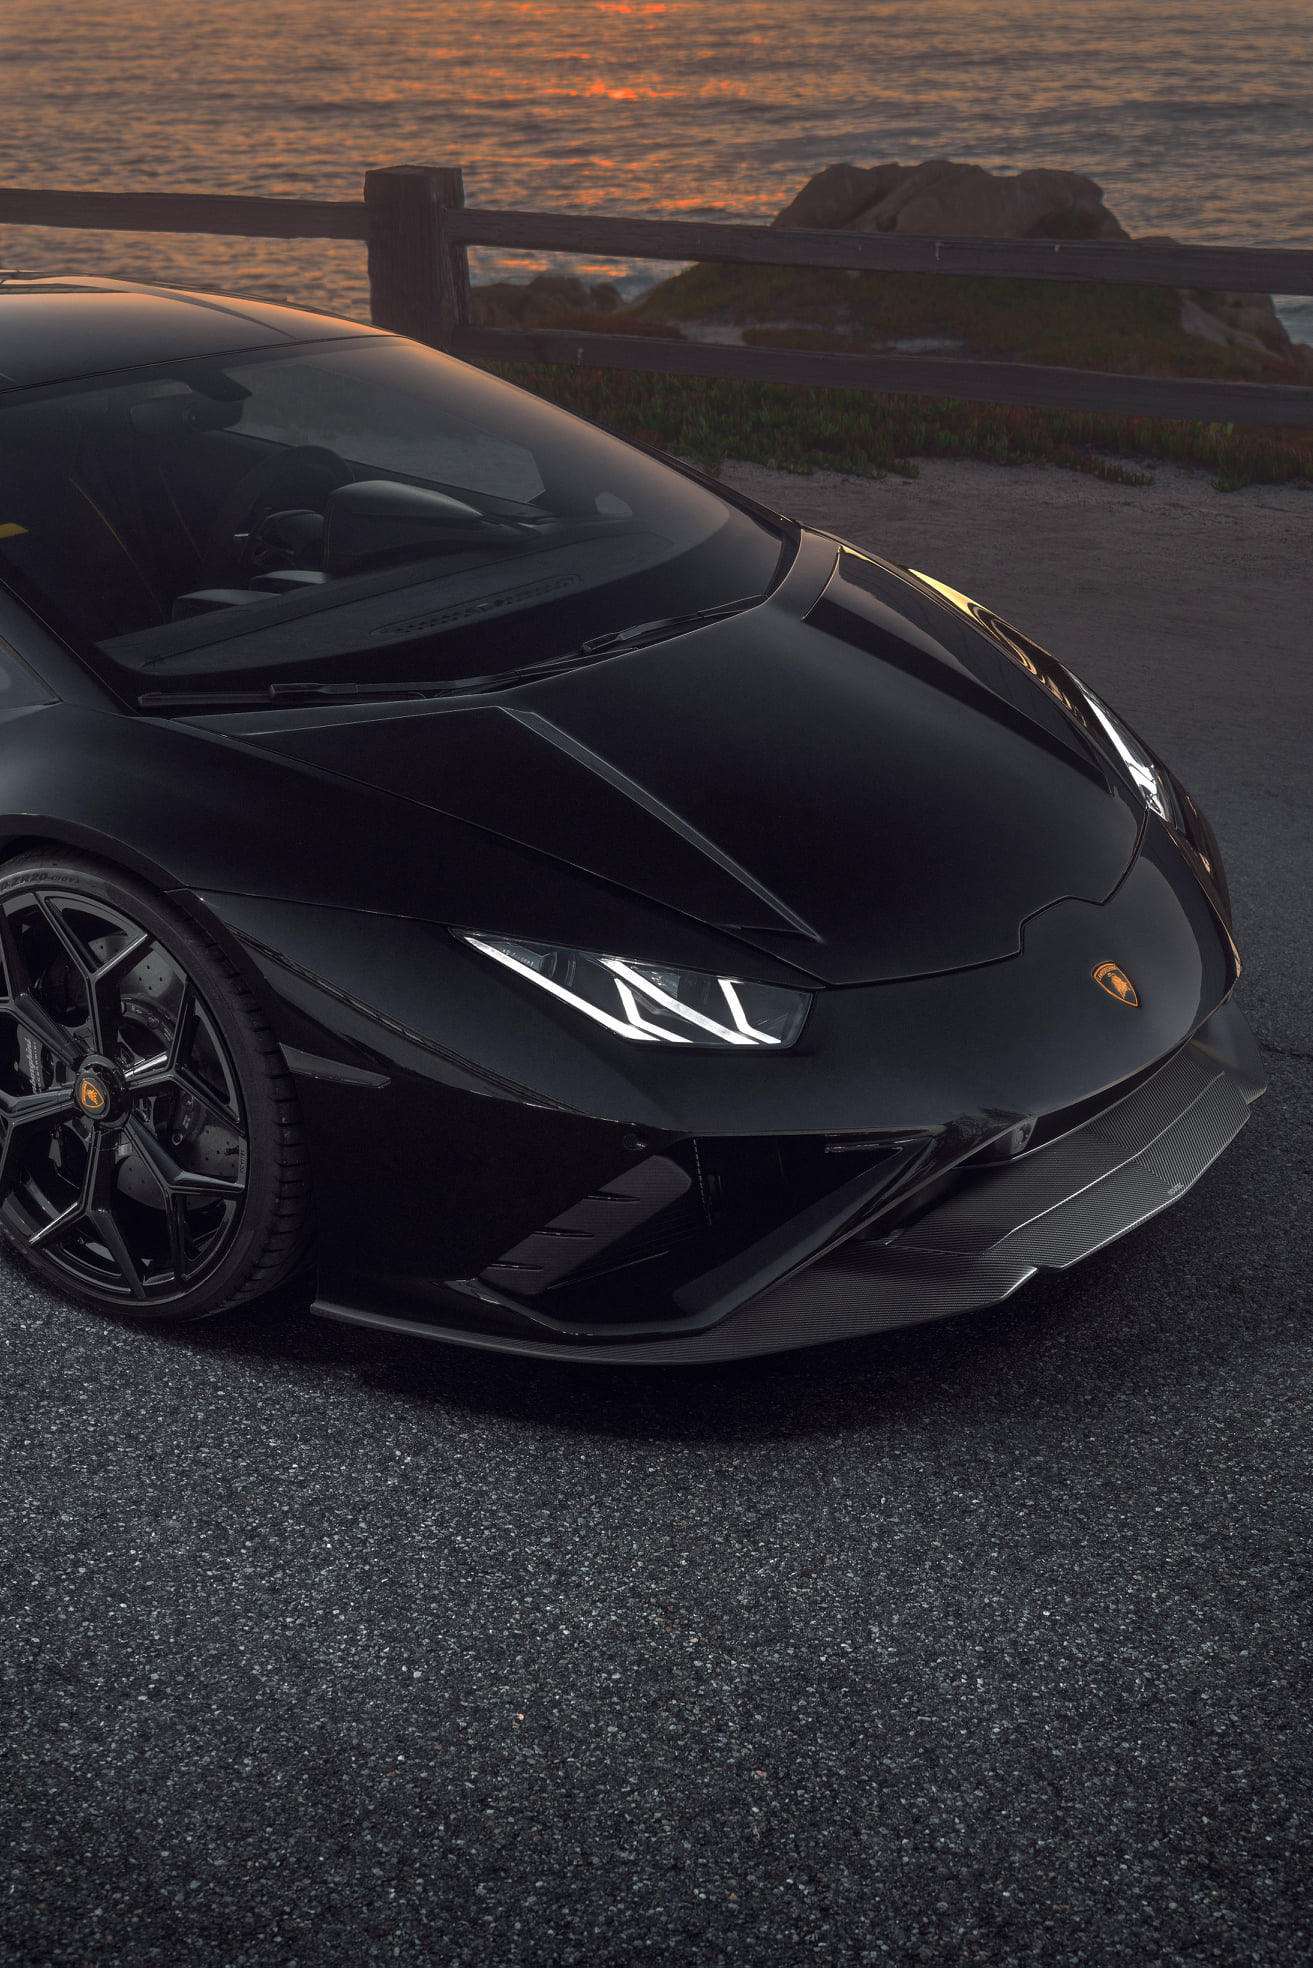 Lamborghini-Huracan-Evo-RWD-by-Novitec-10